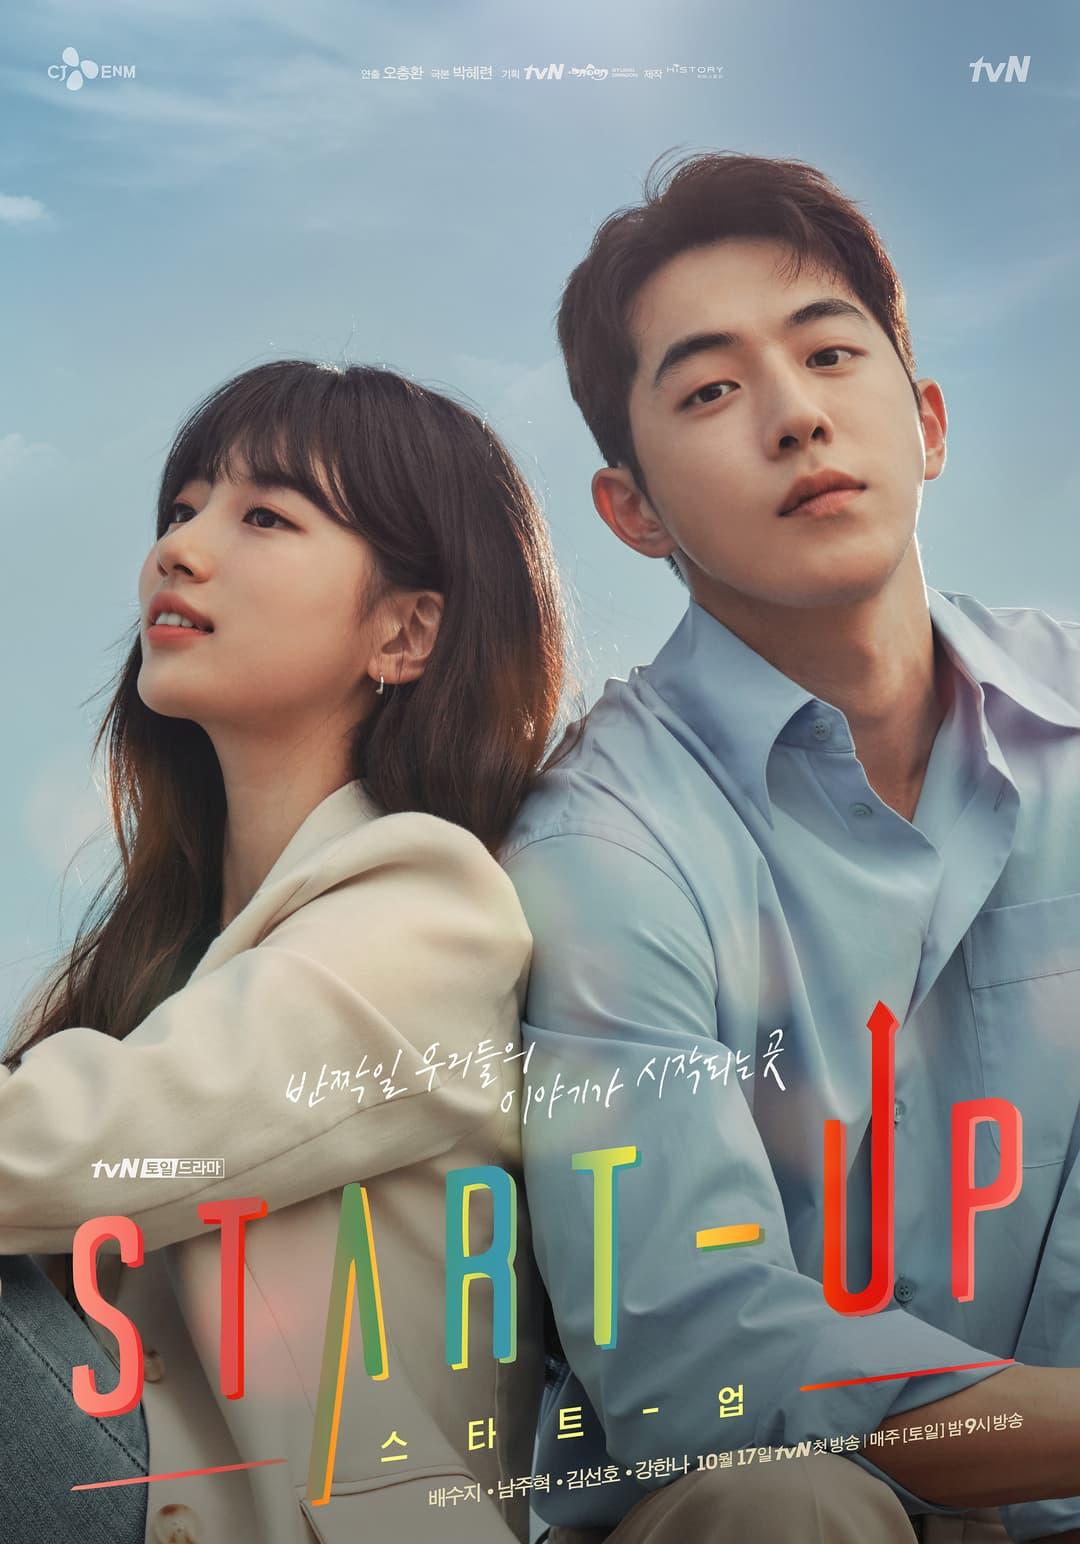 >Start-Up (2020) ตอนที่ 1-16 ซับไทย